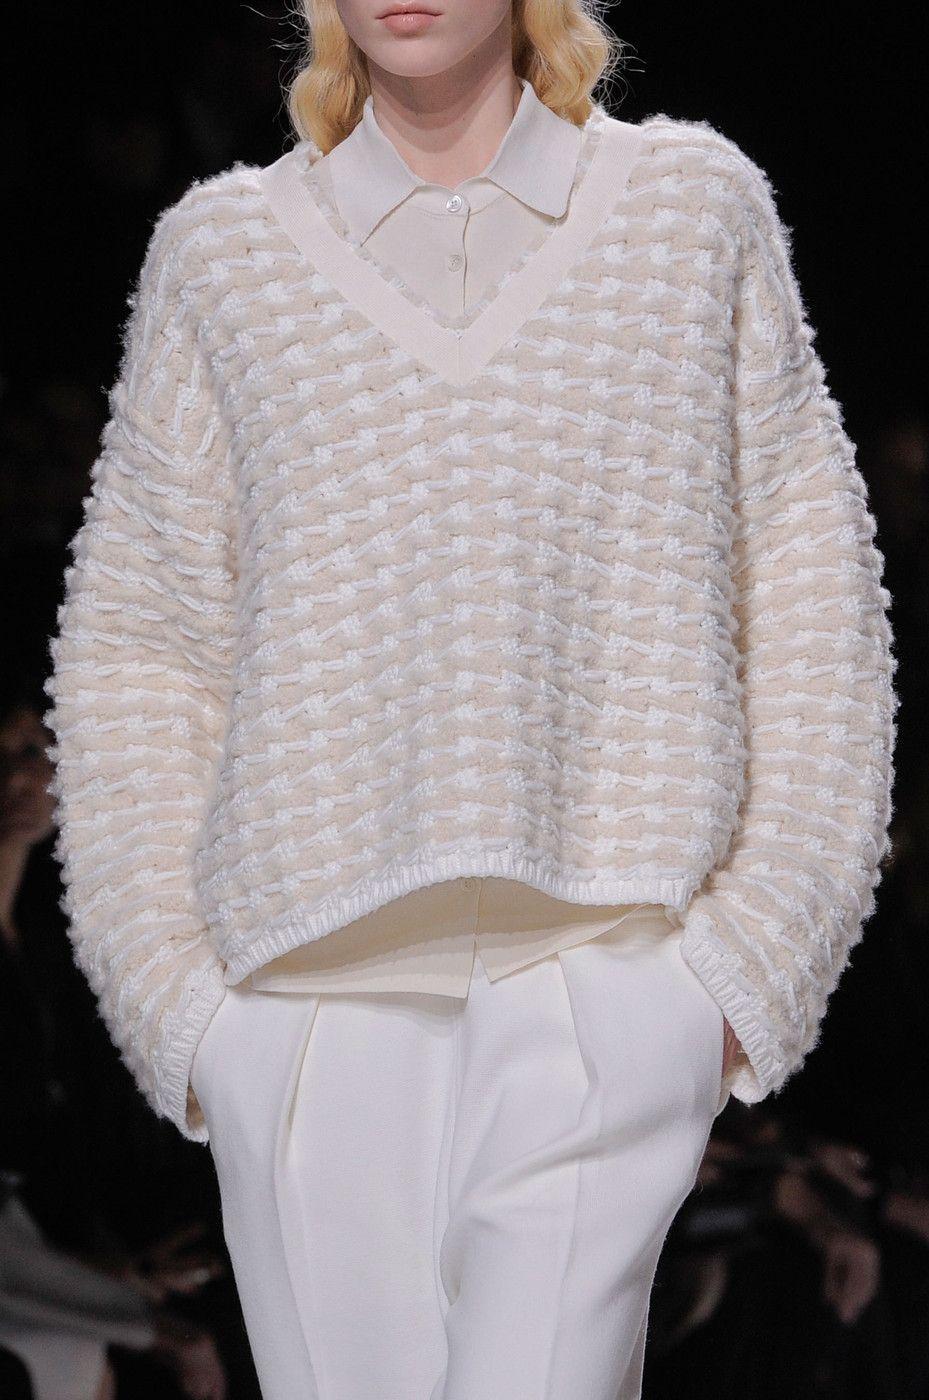 Sonia Rykiel at Paris Fashion Week Fall 2014 - StyleBistro